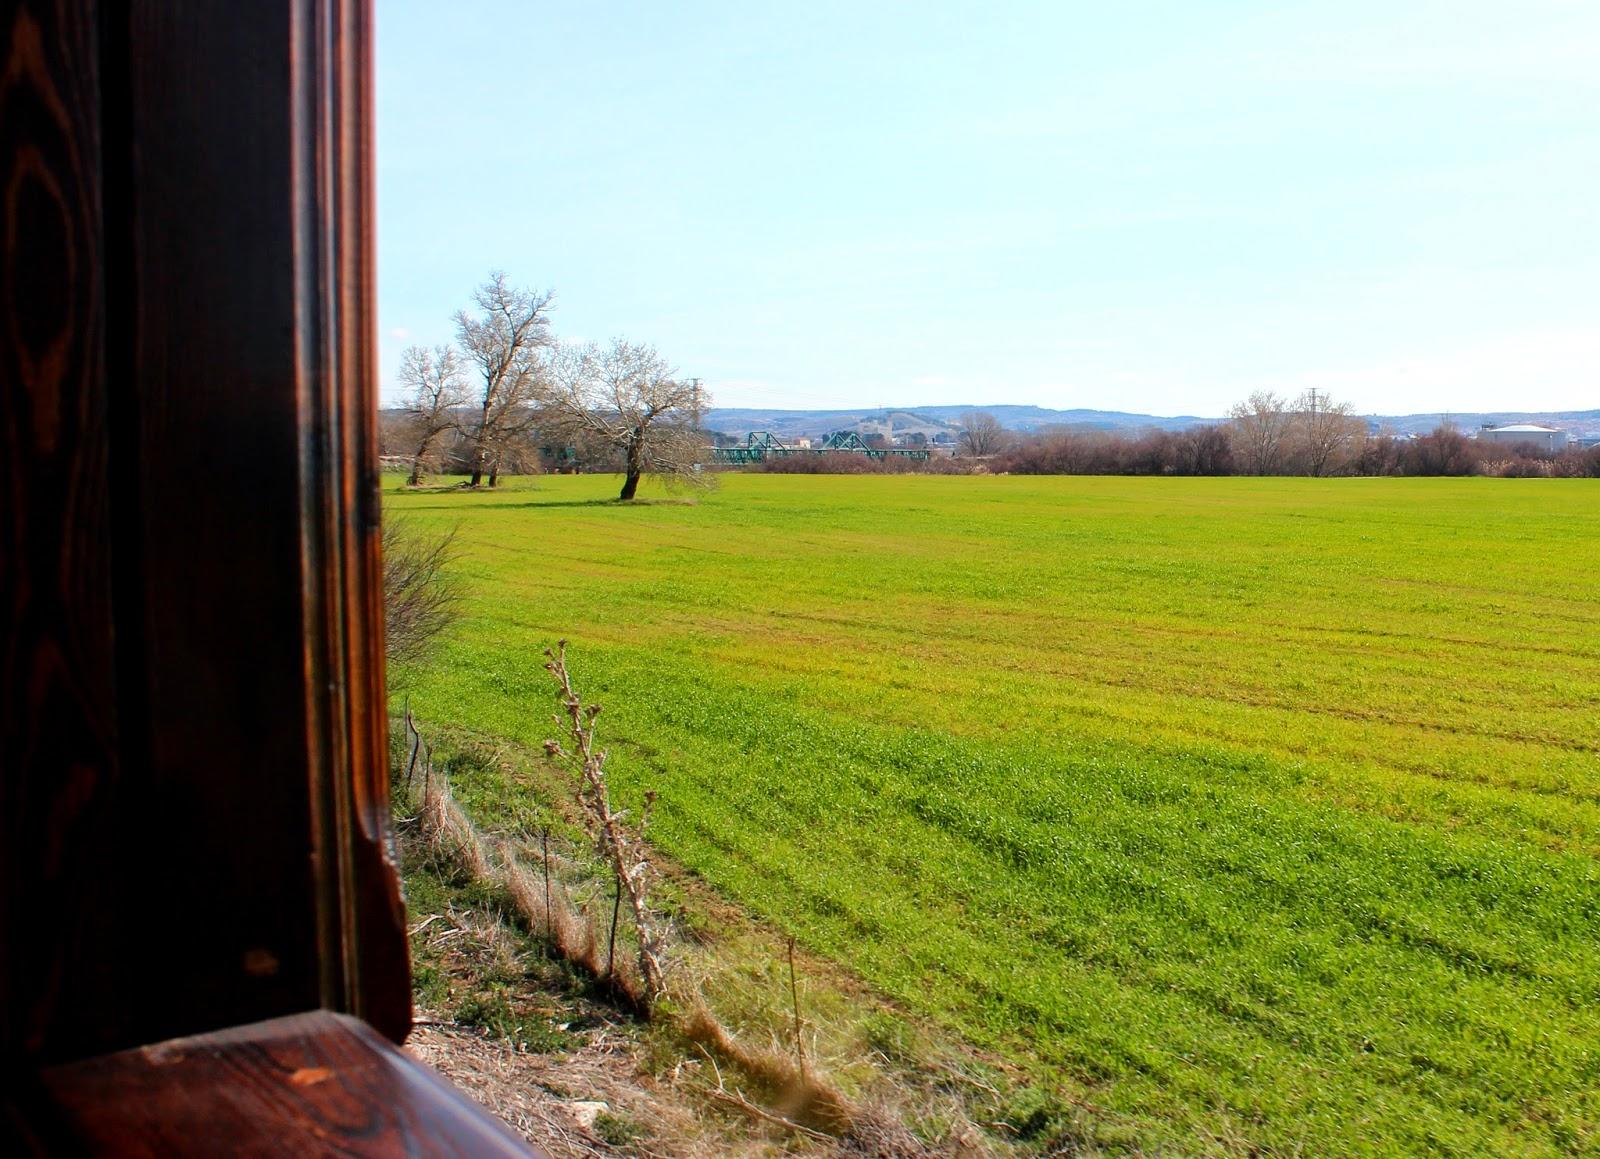 Paisajes por la ventana de un tren de vapor. Tren de Arganda